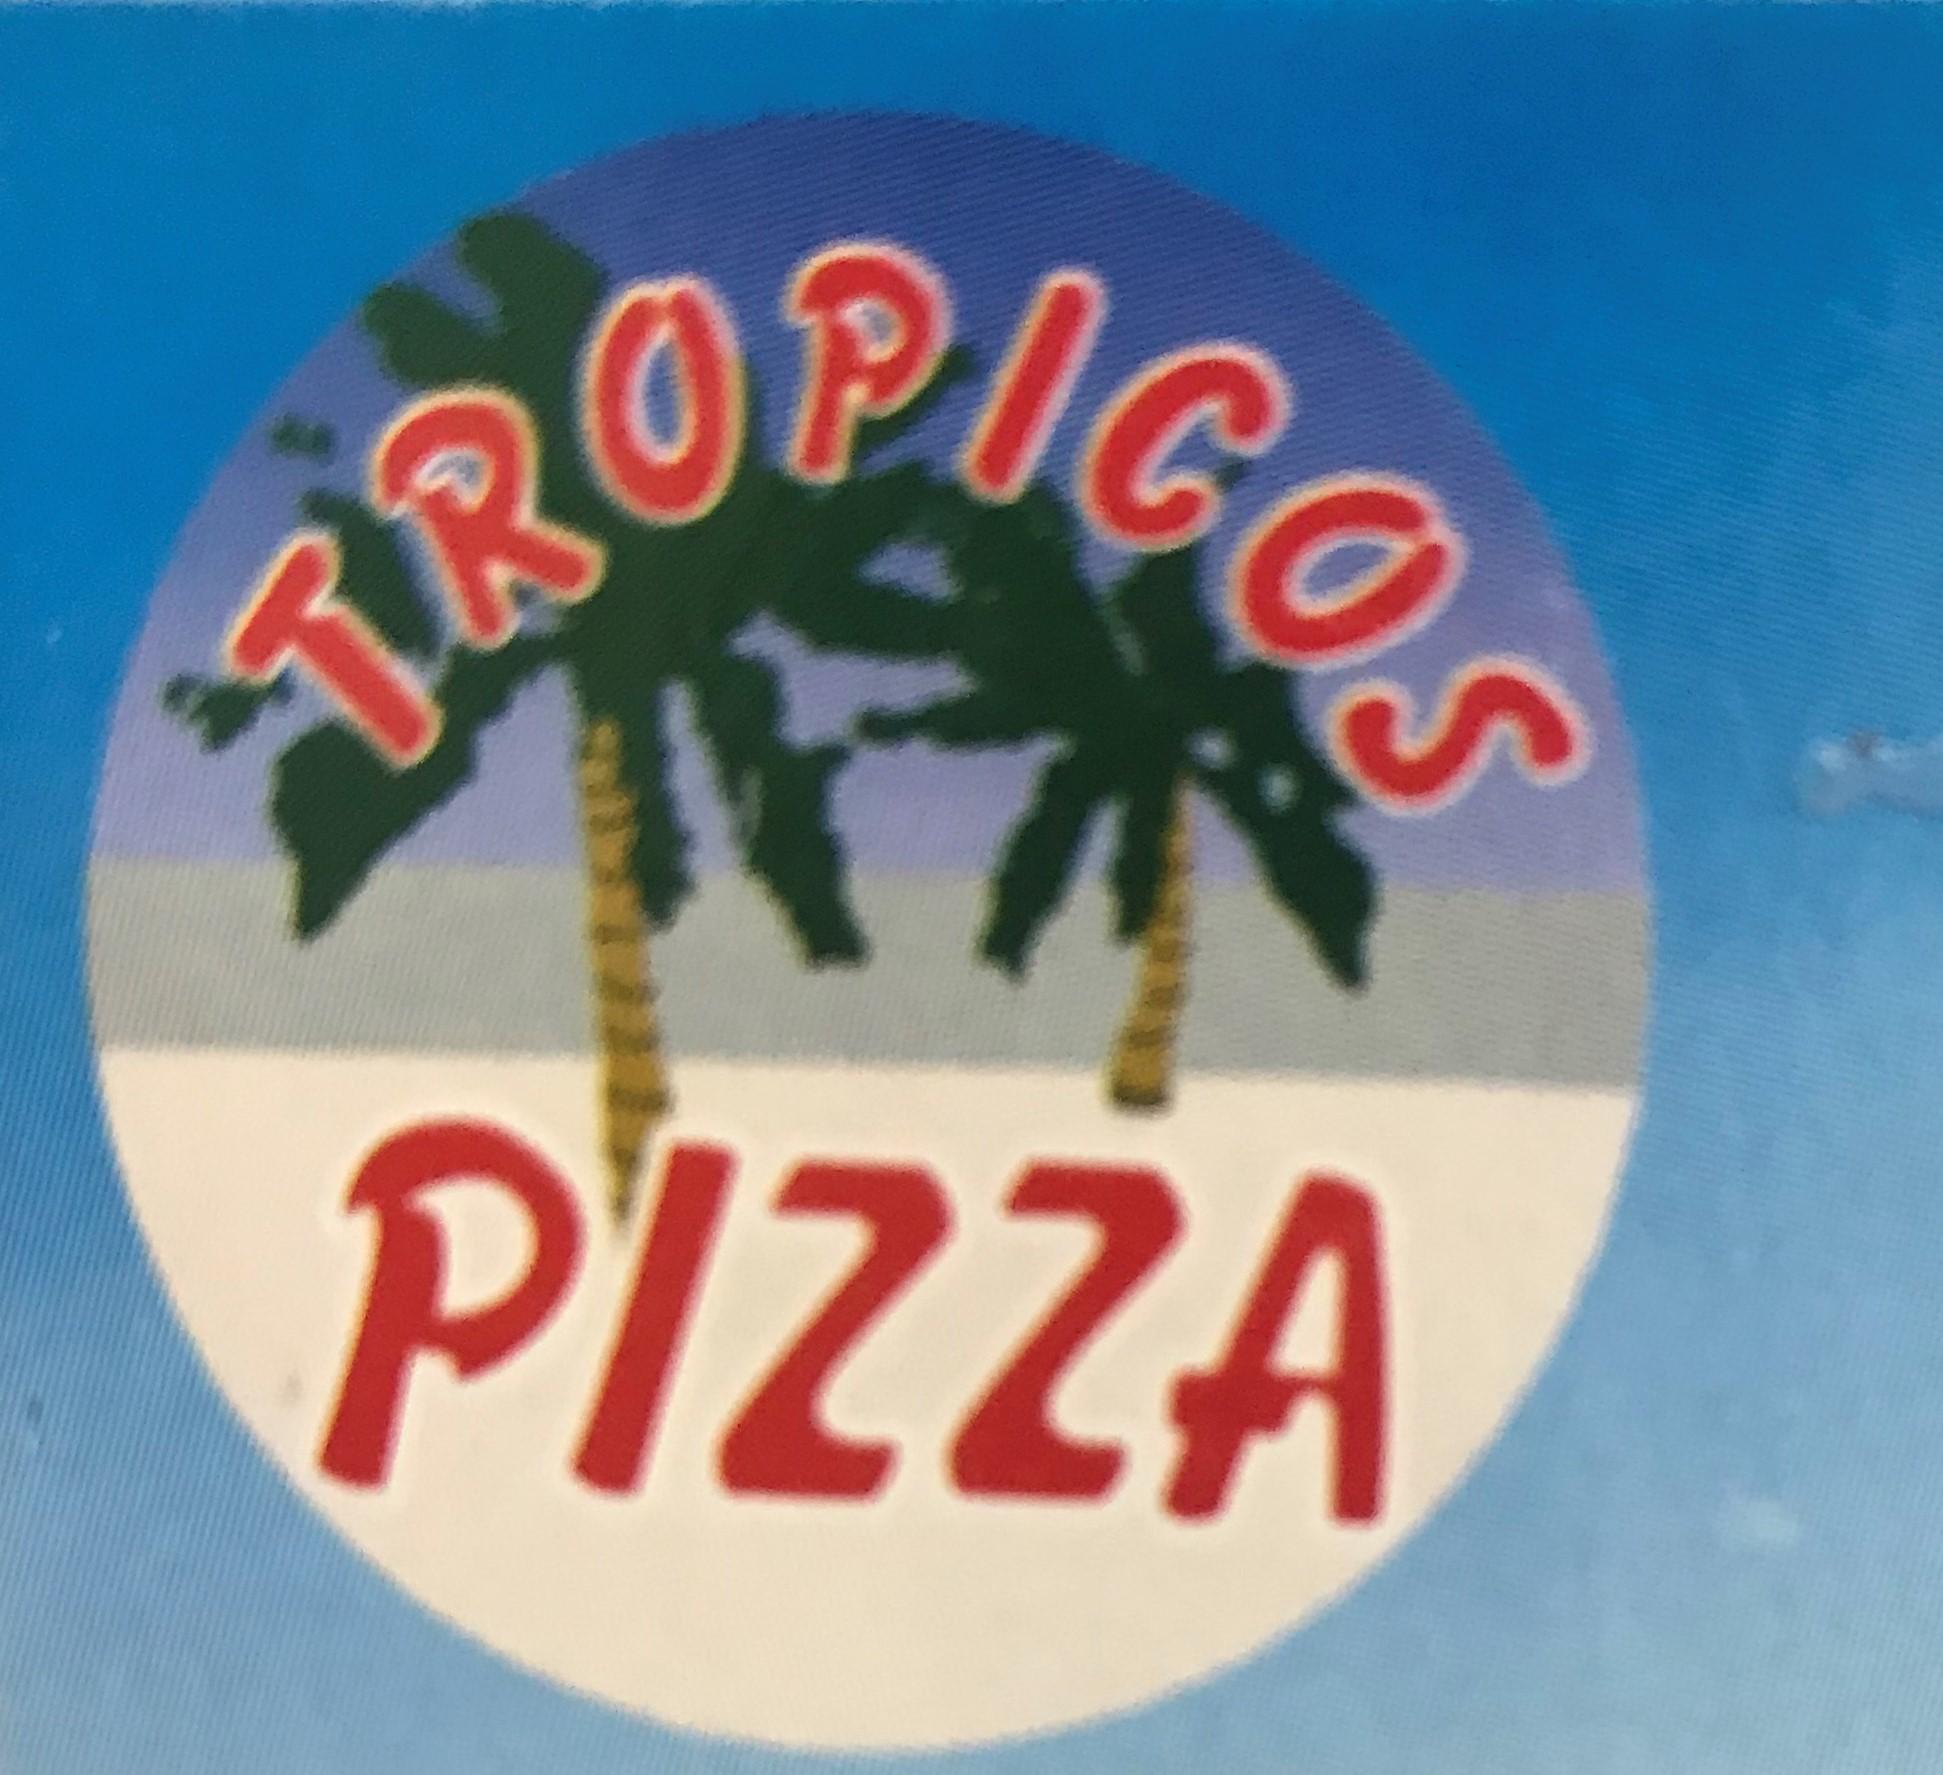 Tropicos Pizza